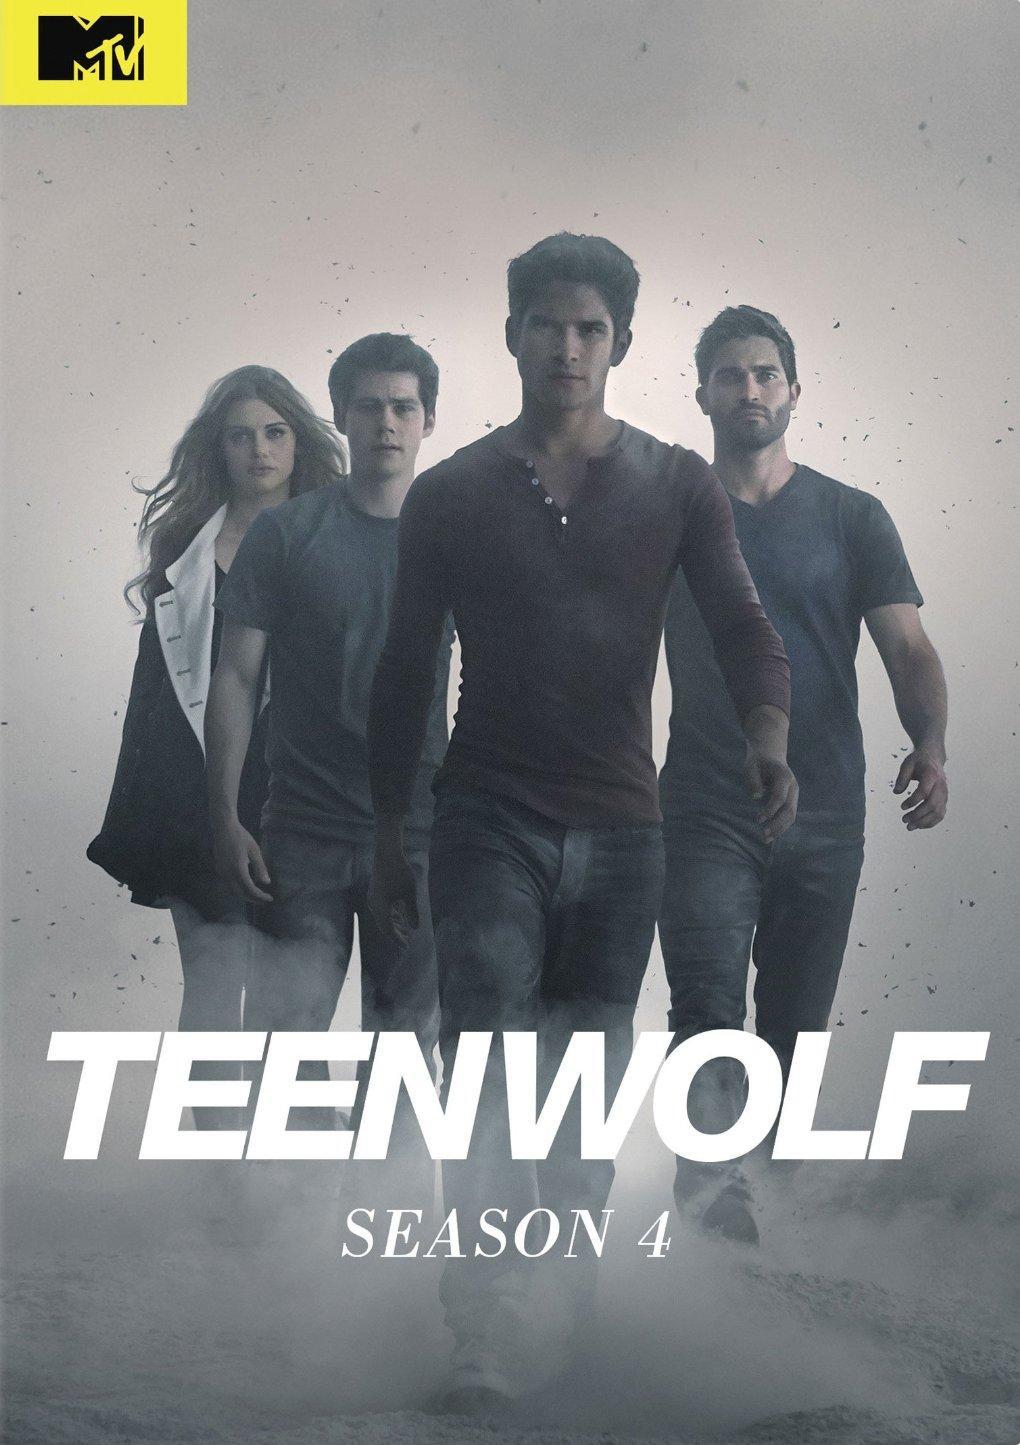 teen wolf season 2 episode 2 full episode